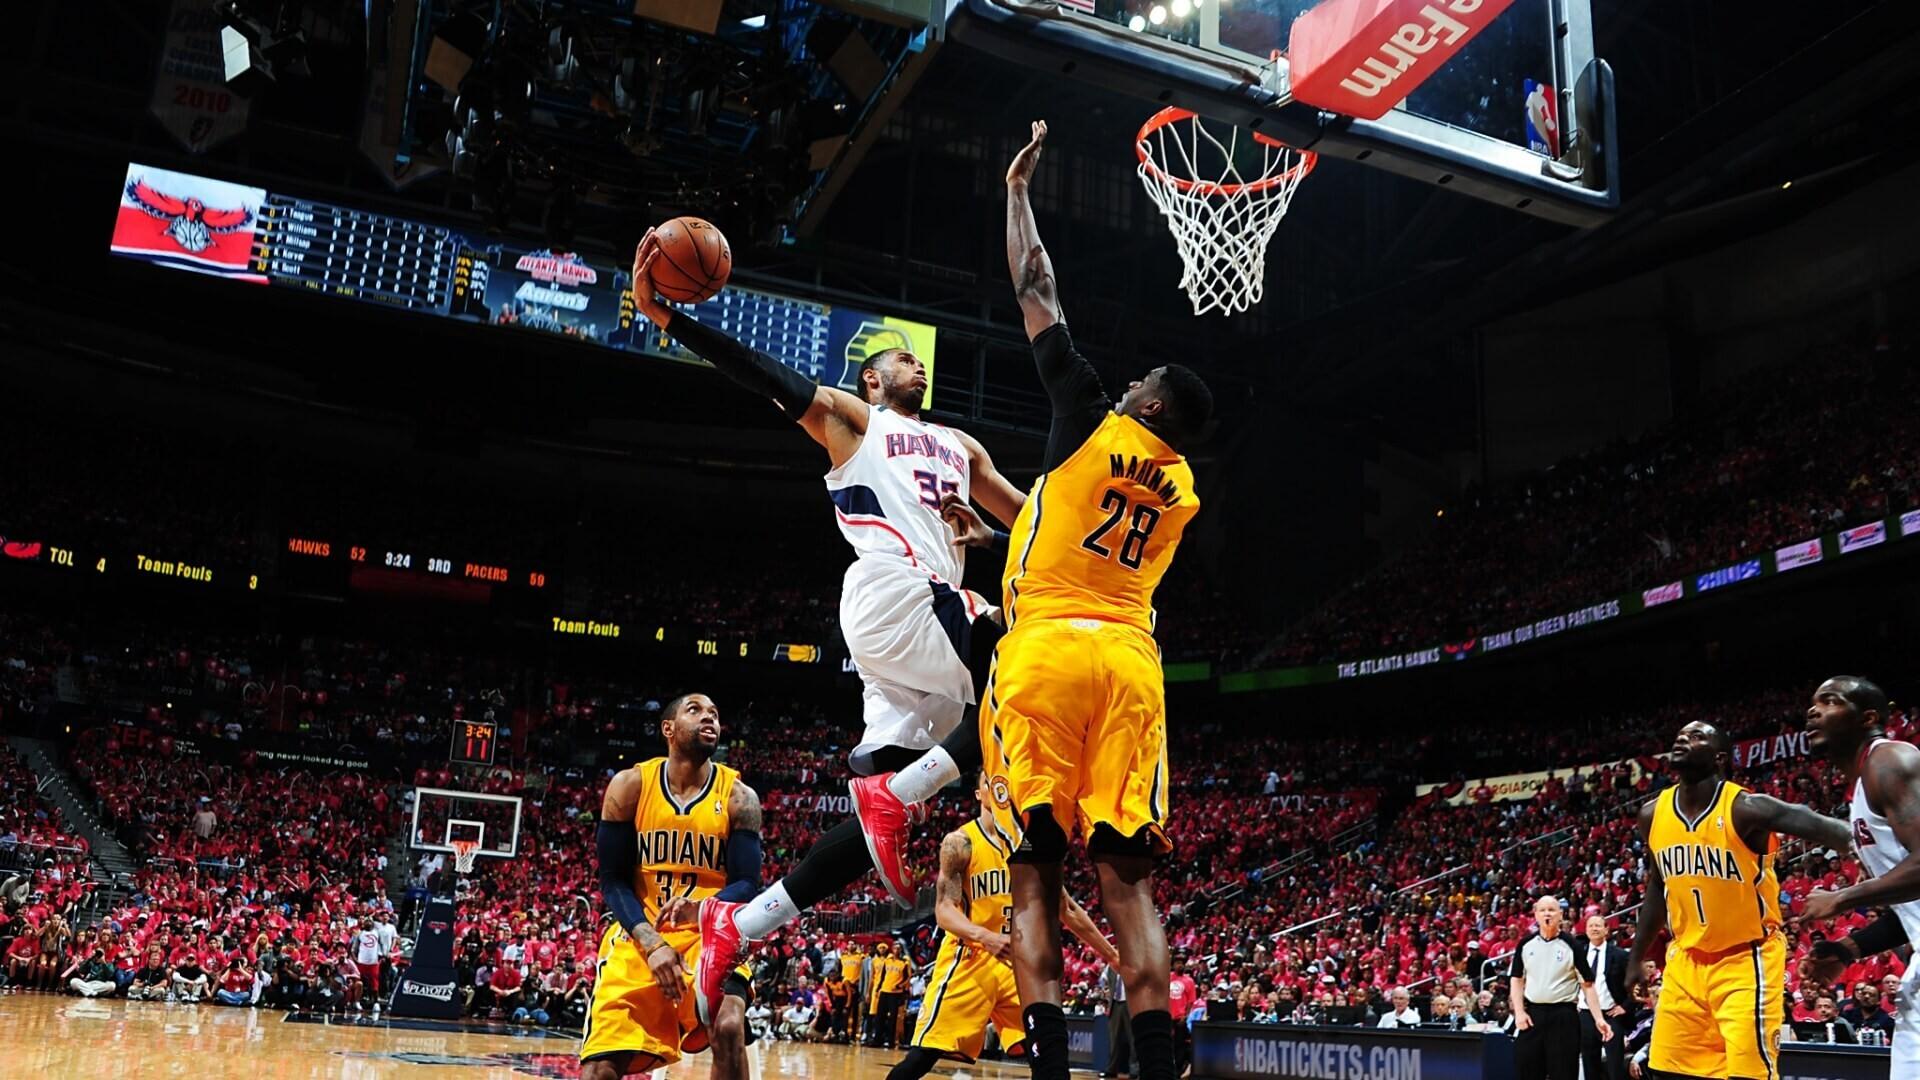 Sport Basketball Game Photo